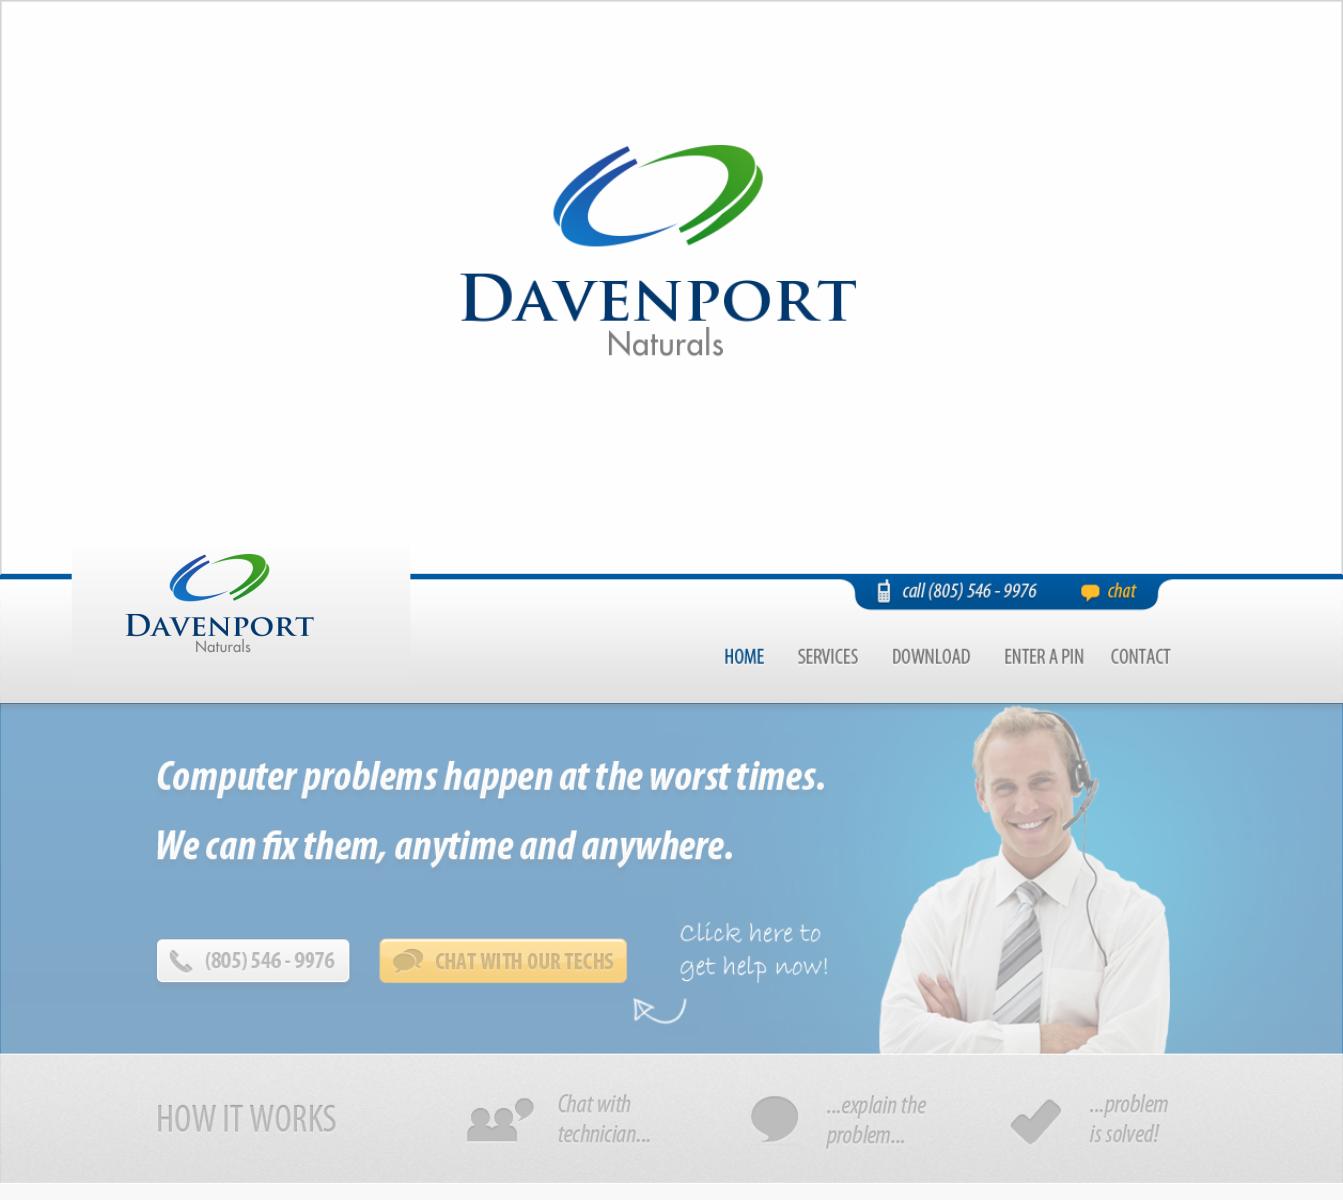 Upmarket, Traditional, Cosmetic Logo Design for Davenport Naturals